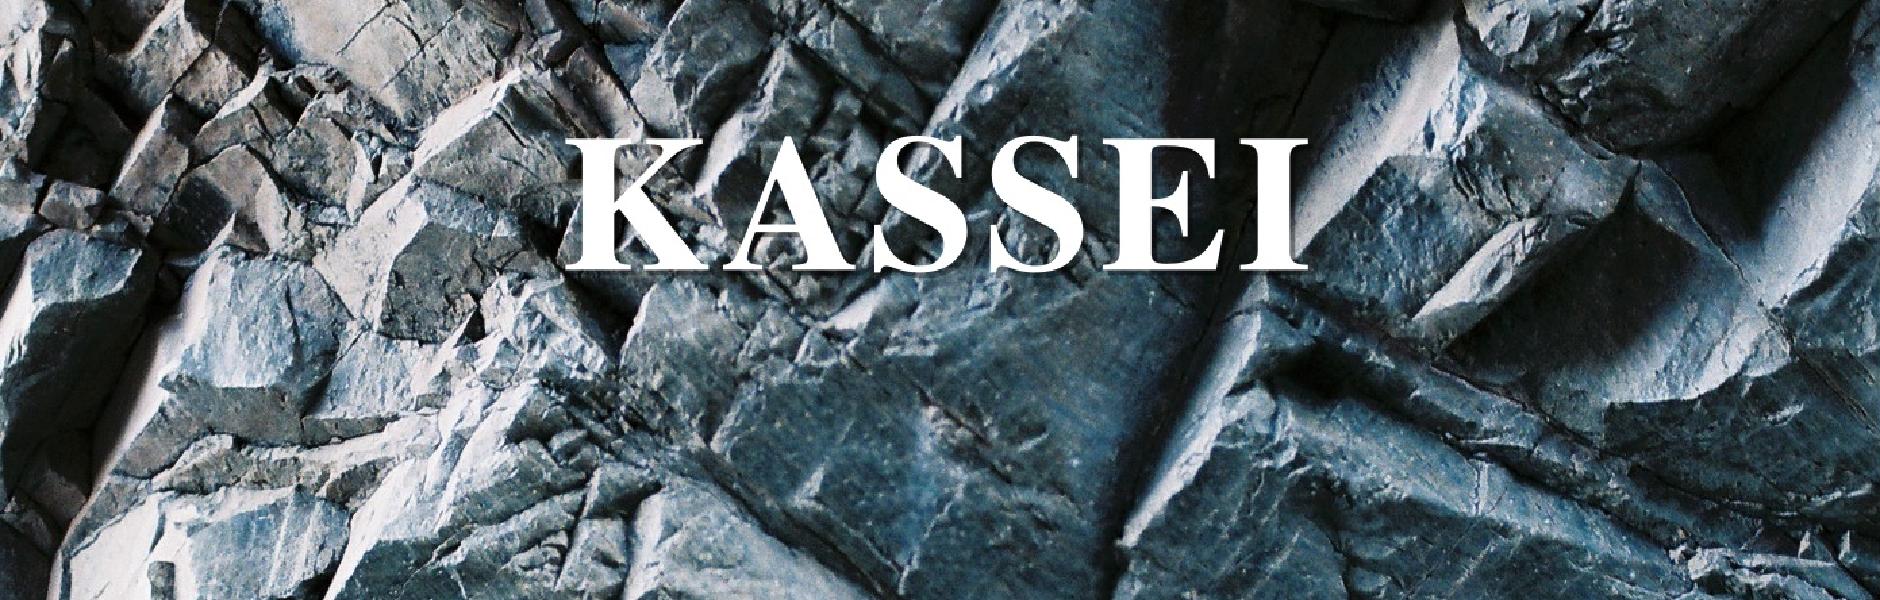 Kassei